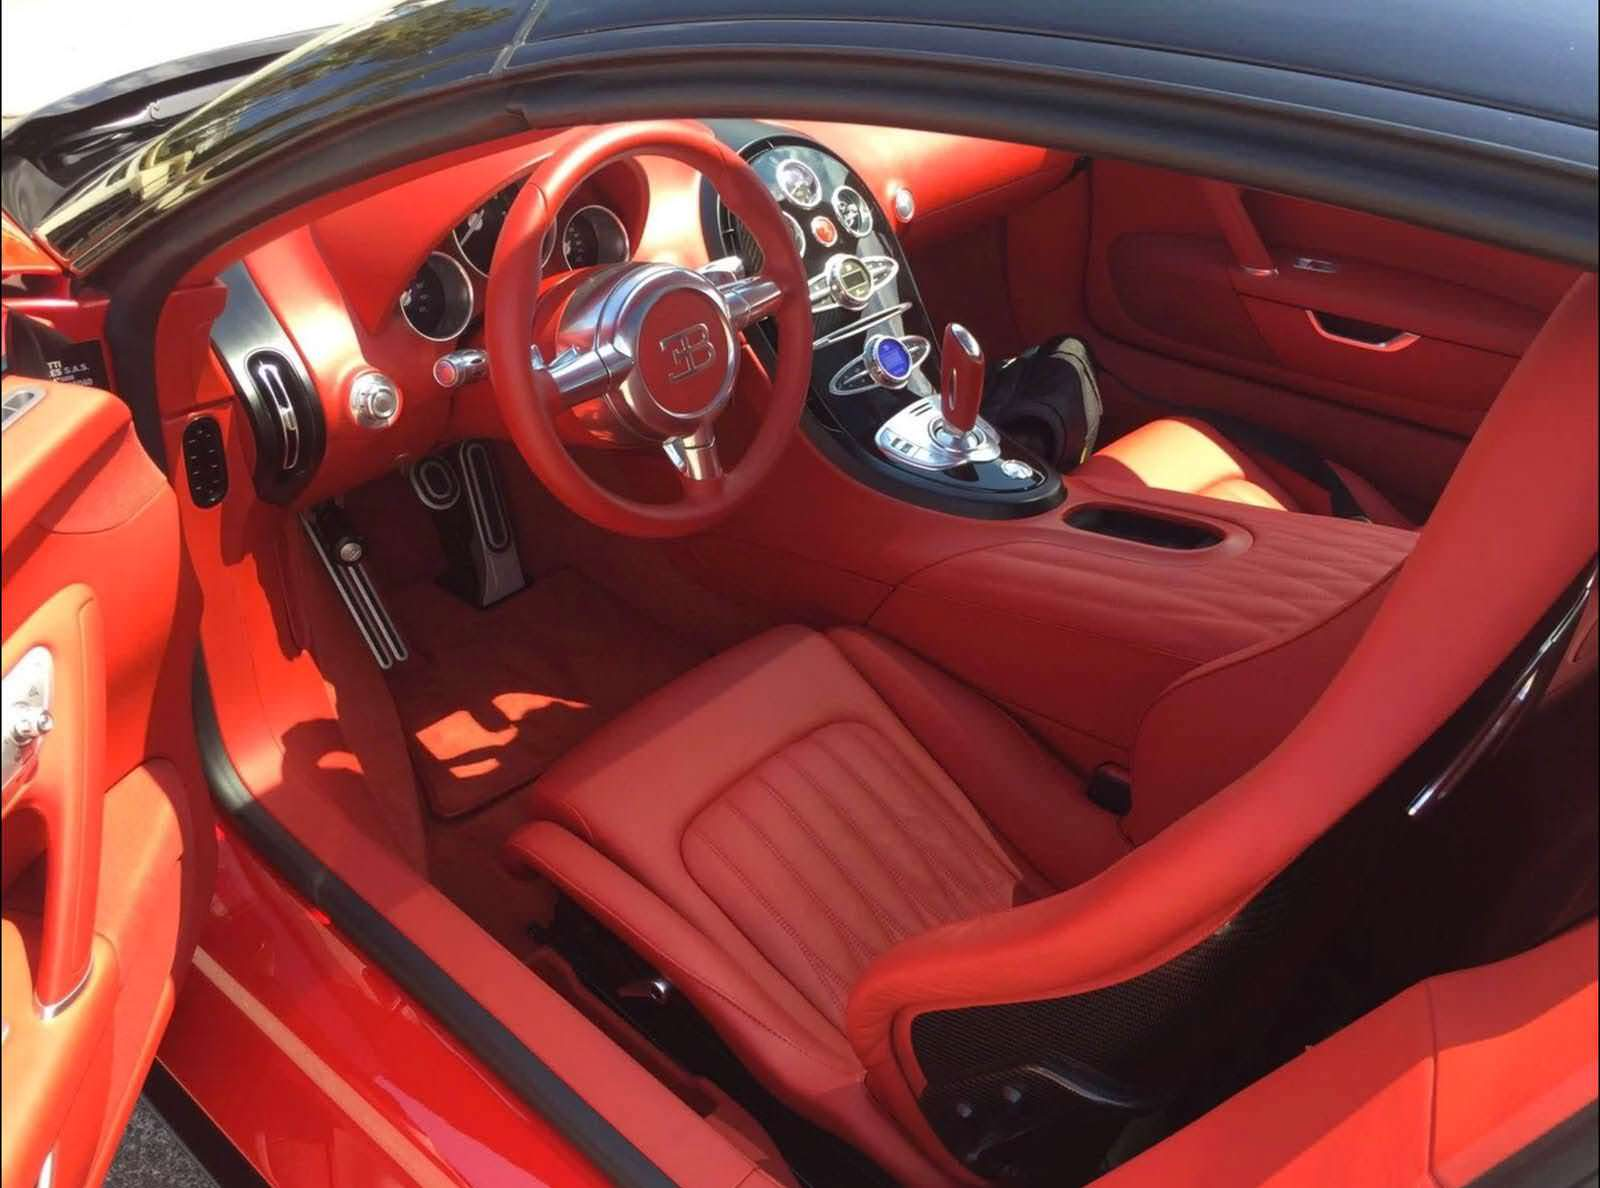 Фото | Интерьер Bugatti Veyron Grand Sport 2009 года